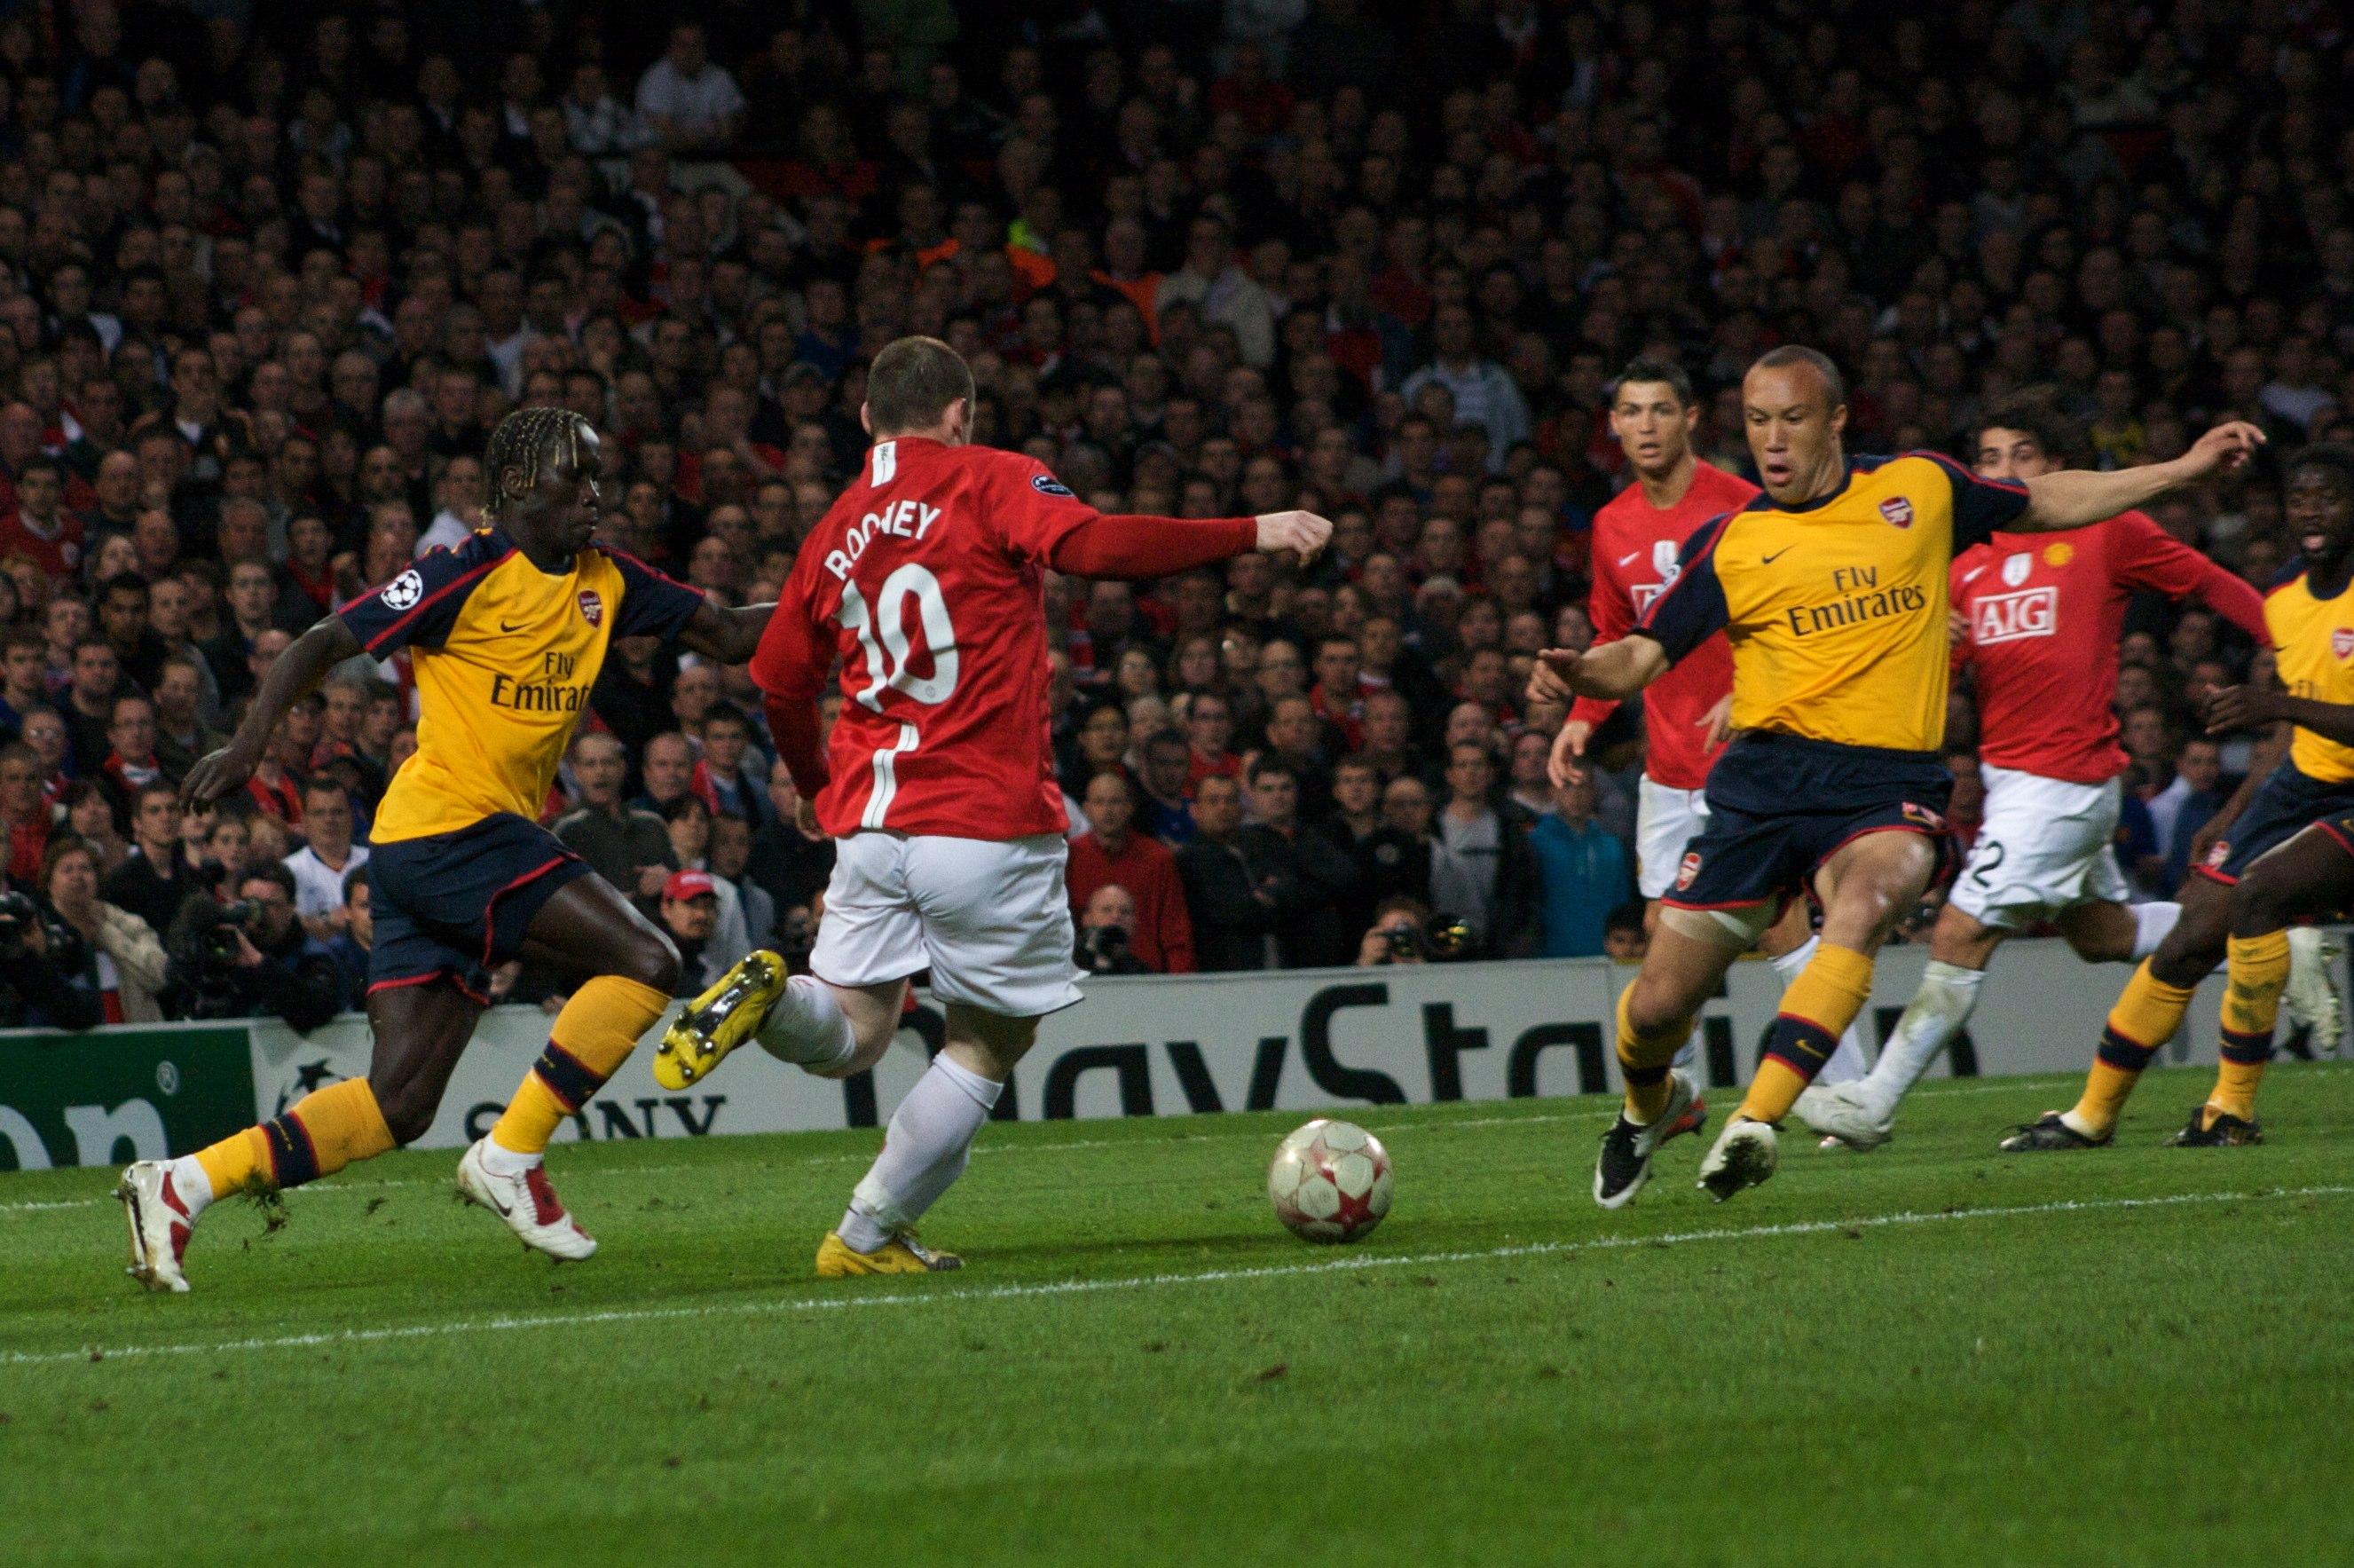 File:Man Utd vs Arsenal 2009-04-29.jpg - Wikimedia Commons